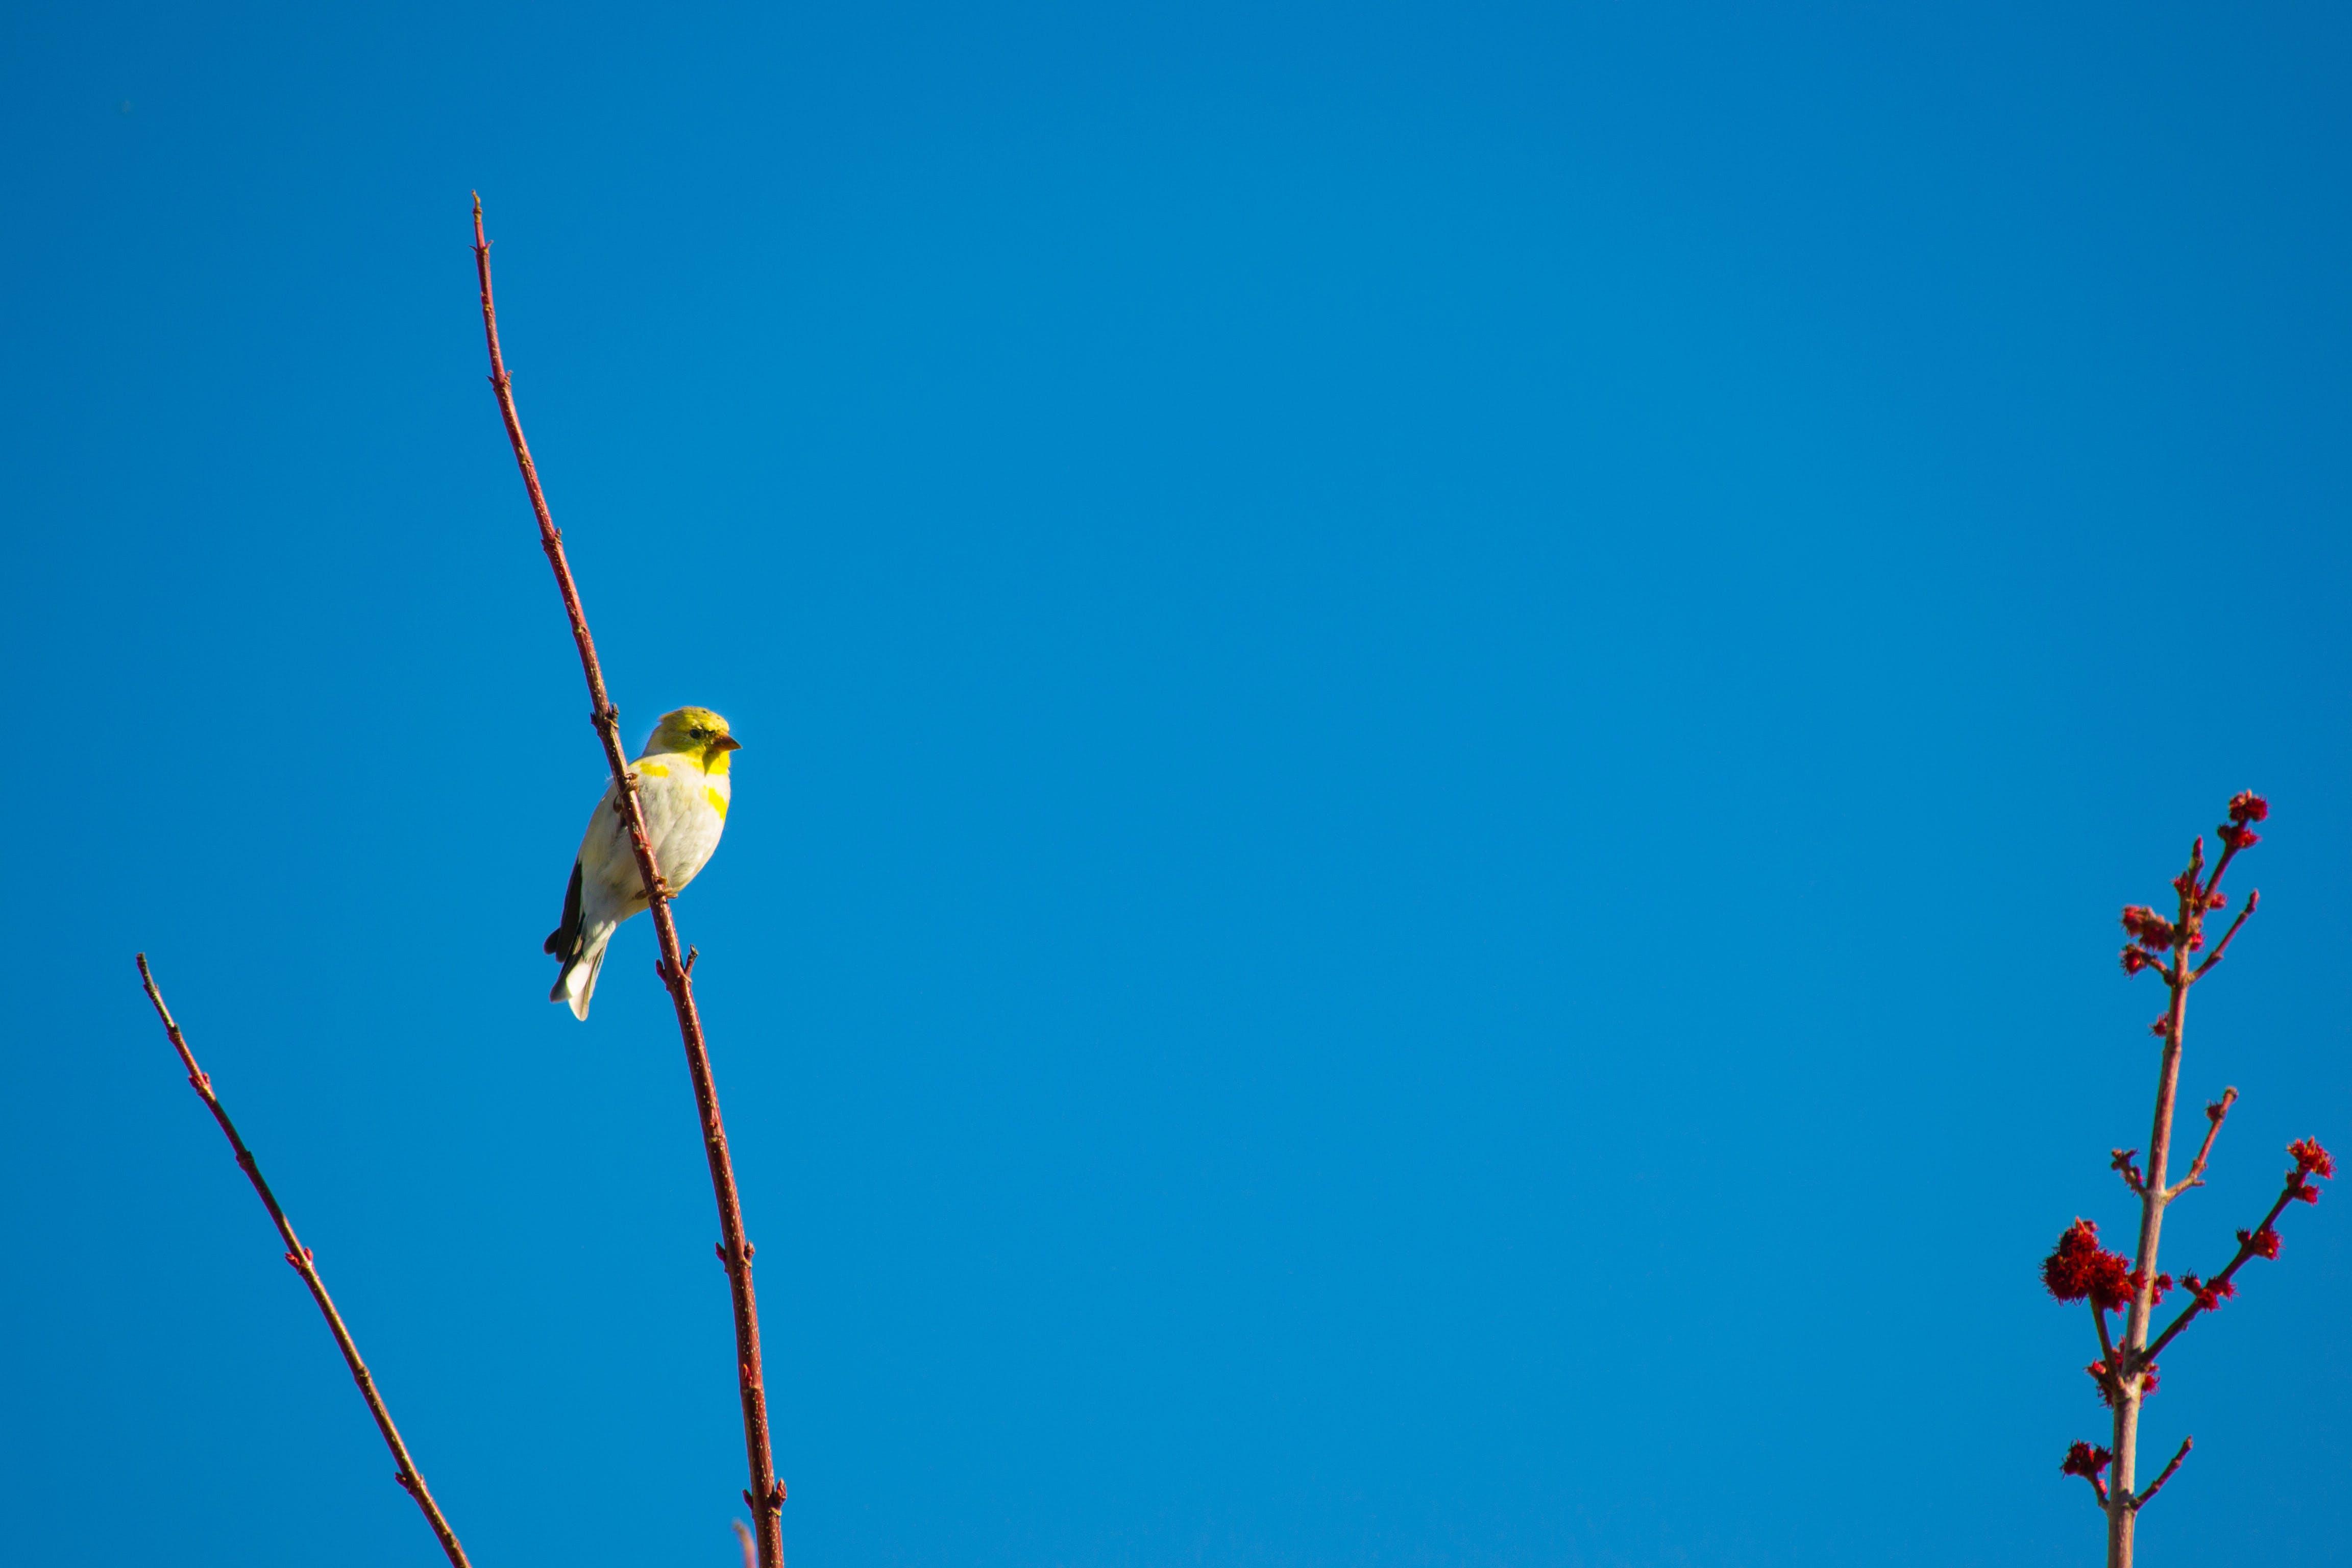 Bird Perched